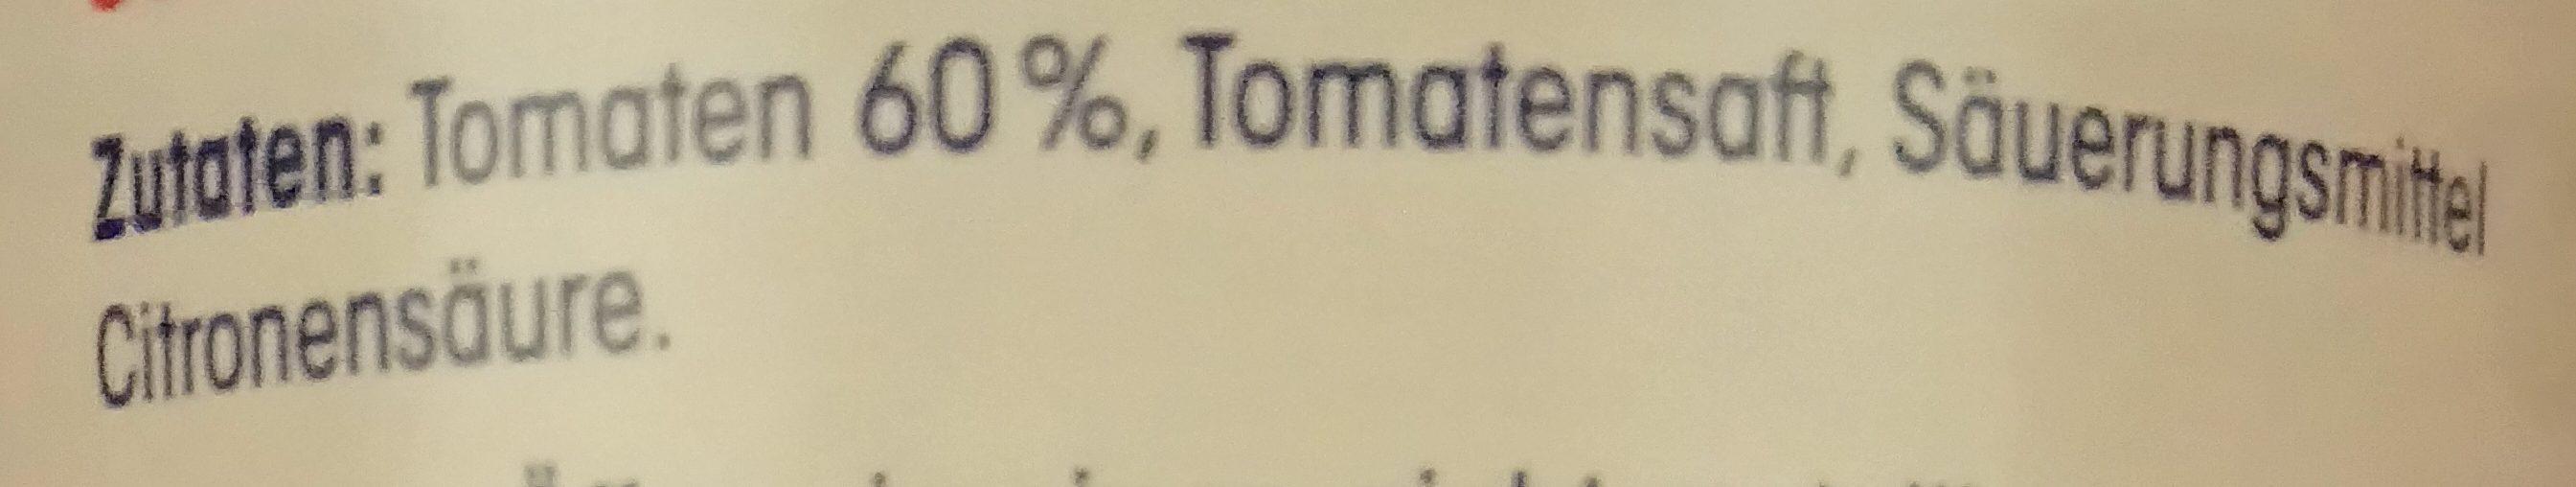 Fein gehackte Tomaten in Tomatensaft - Ingrédients - de